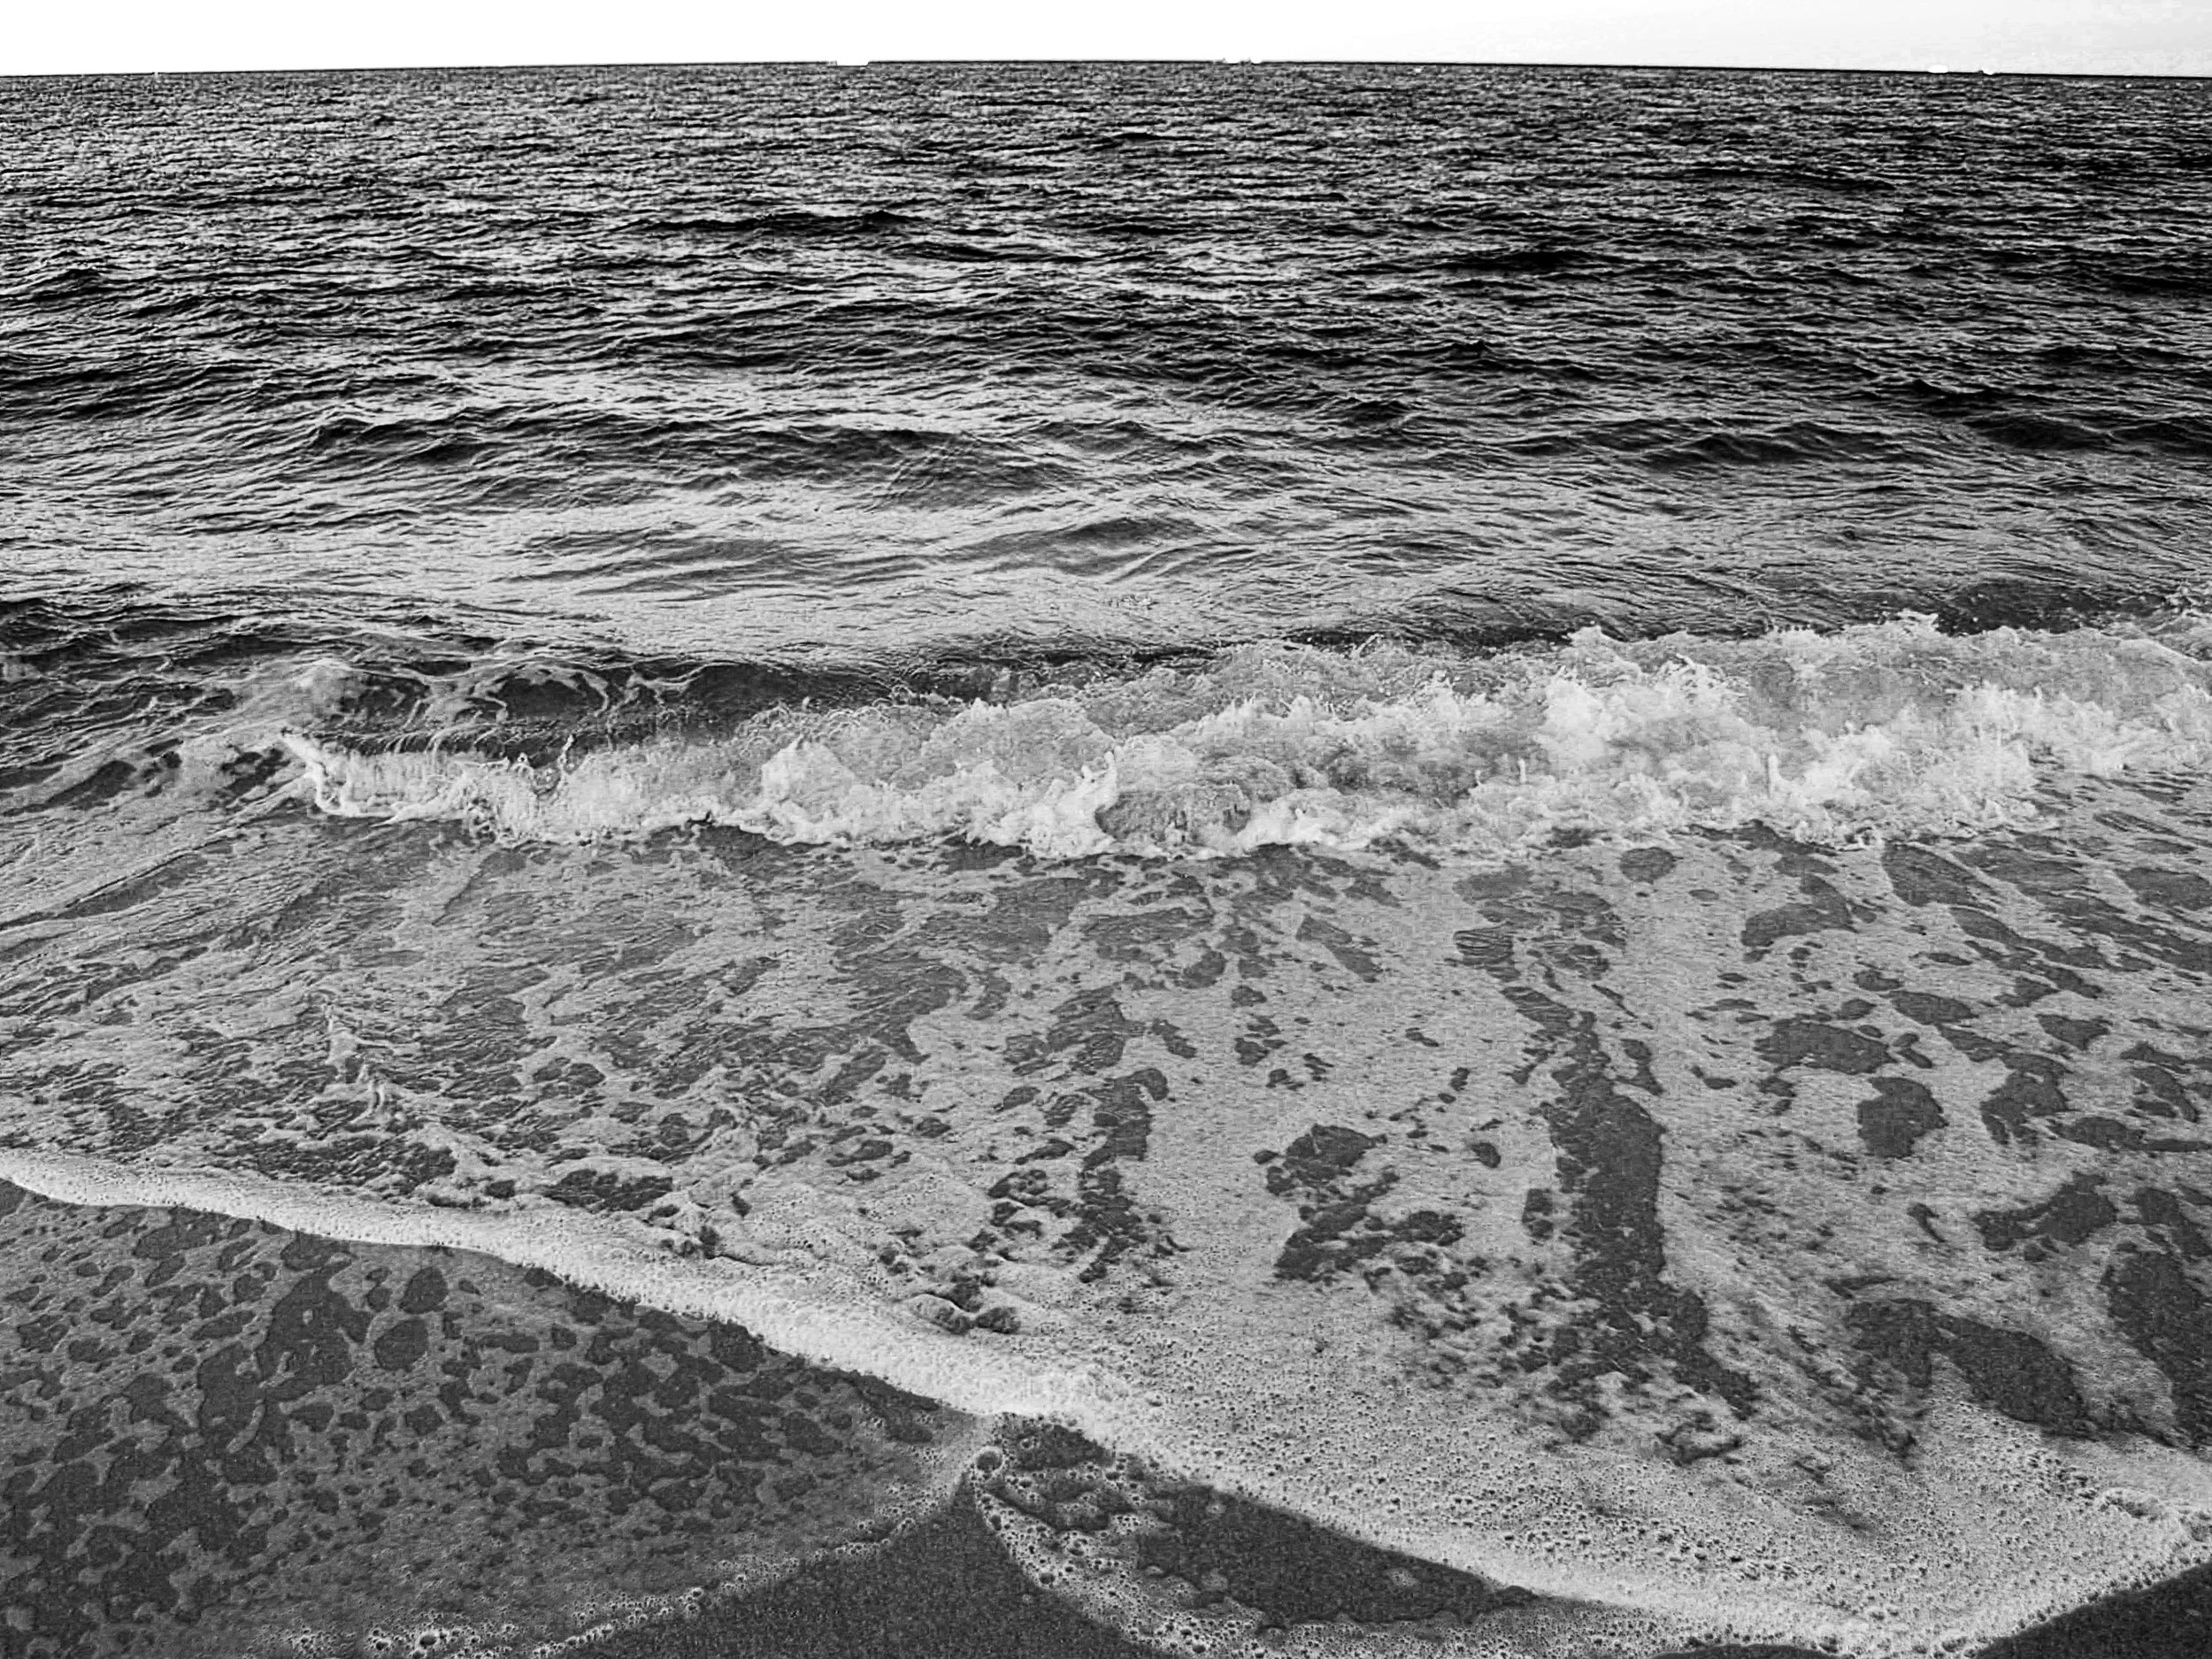 black_and_white_ocean_photography_2.JPG